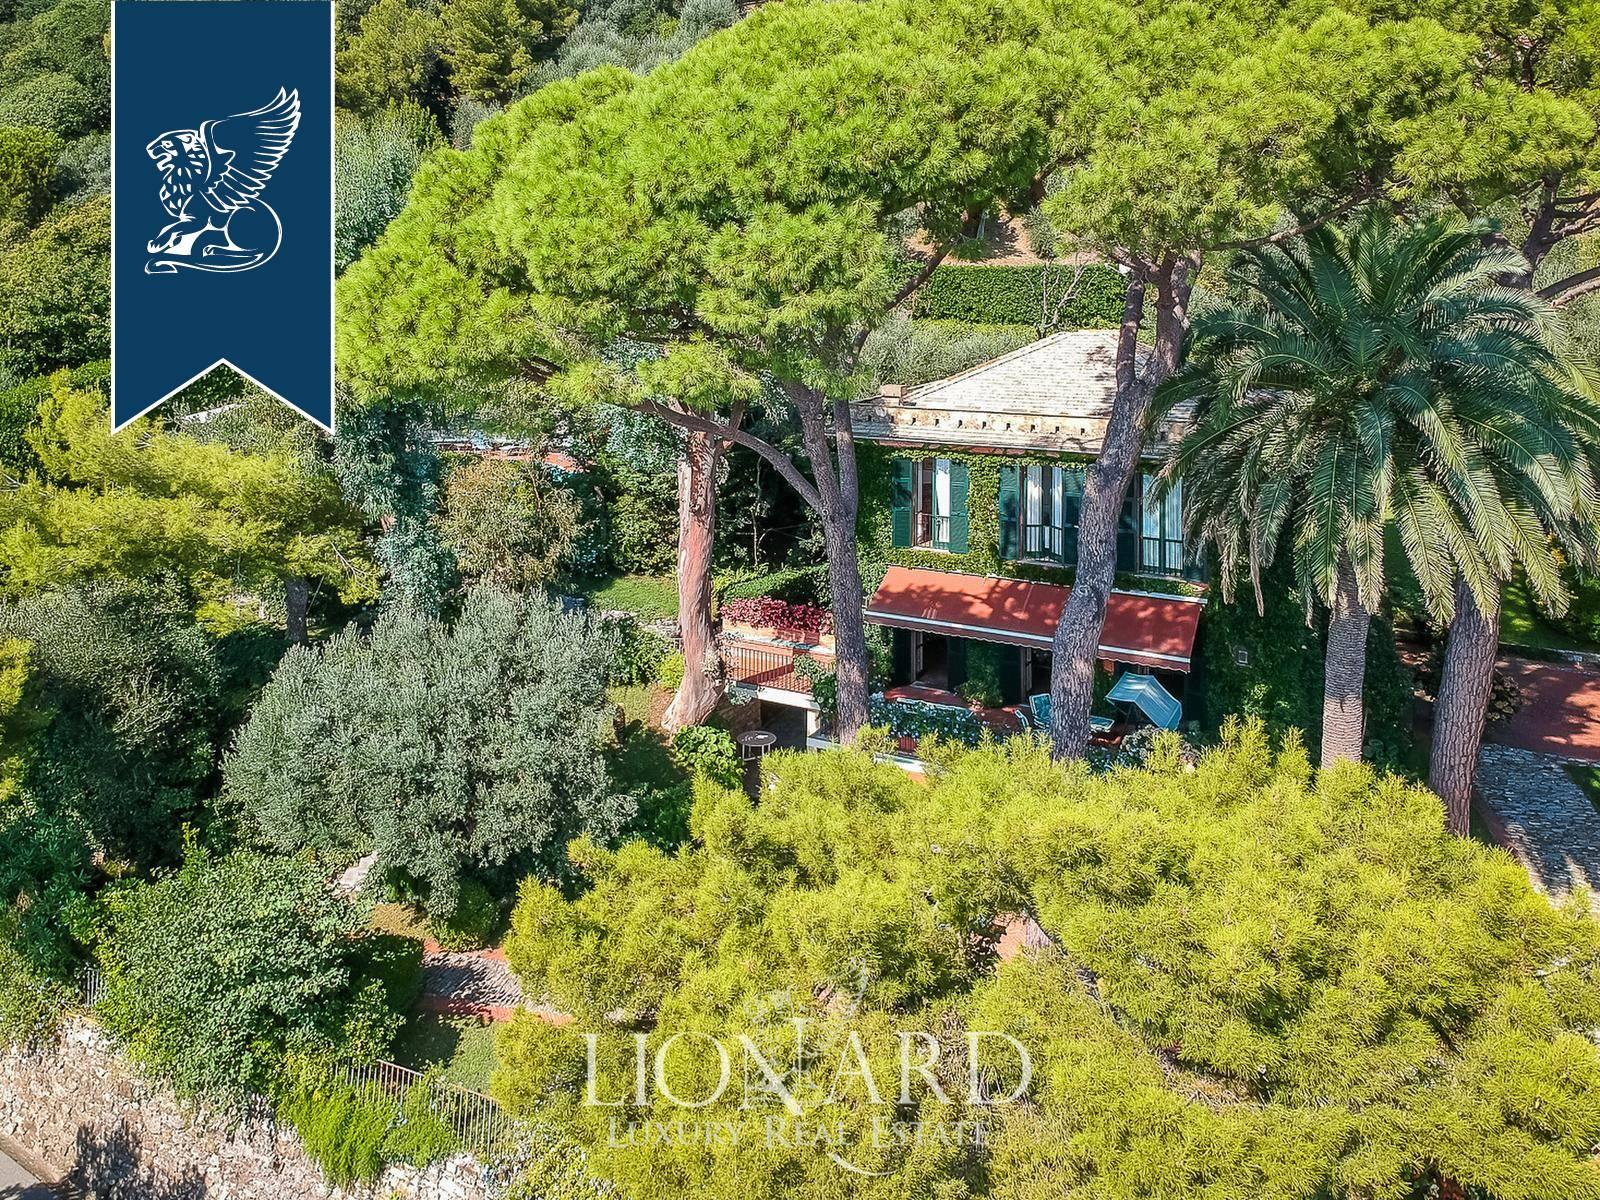 Villa in Vendita a Santa Margherita Ligure: 0 locali, 459 mq - Foto 5